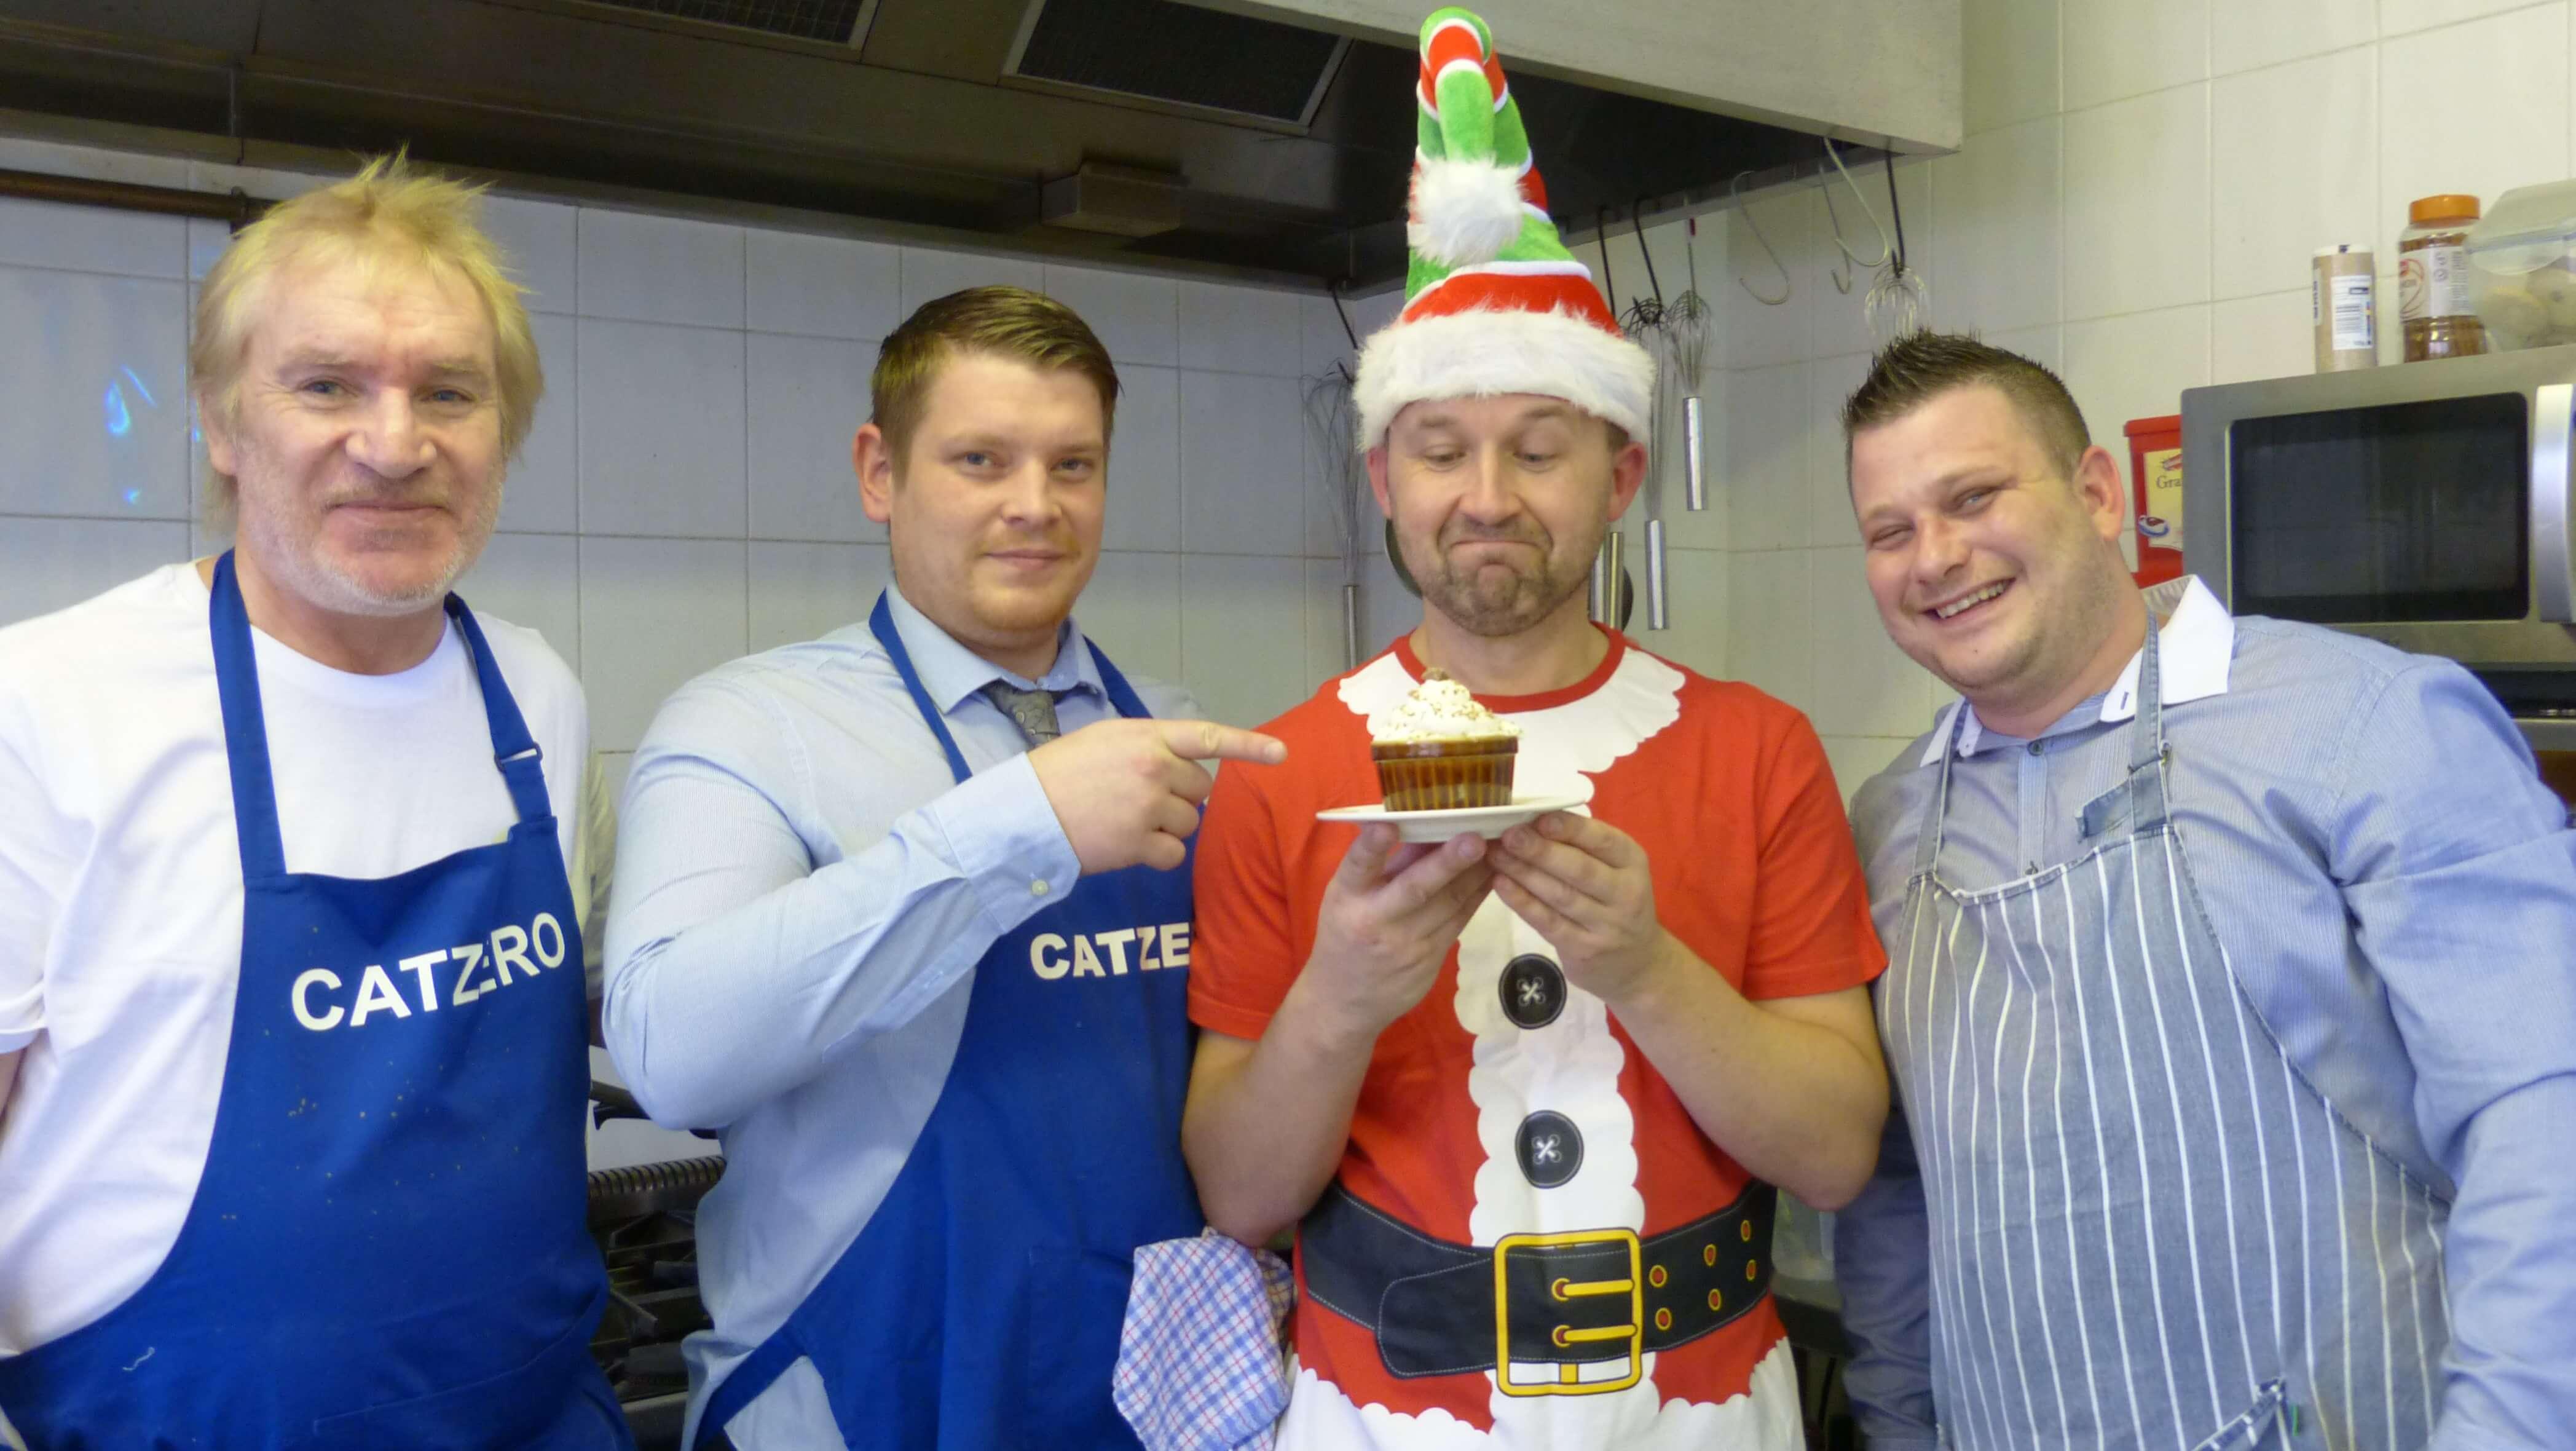 Veterans cook up a festive treat